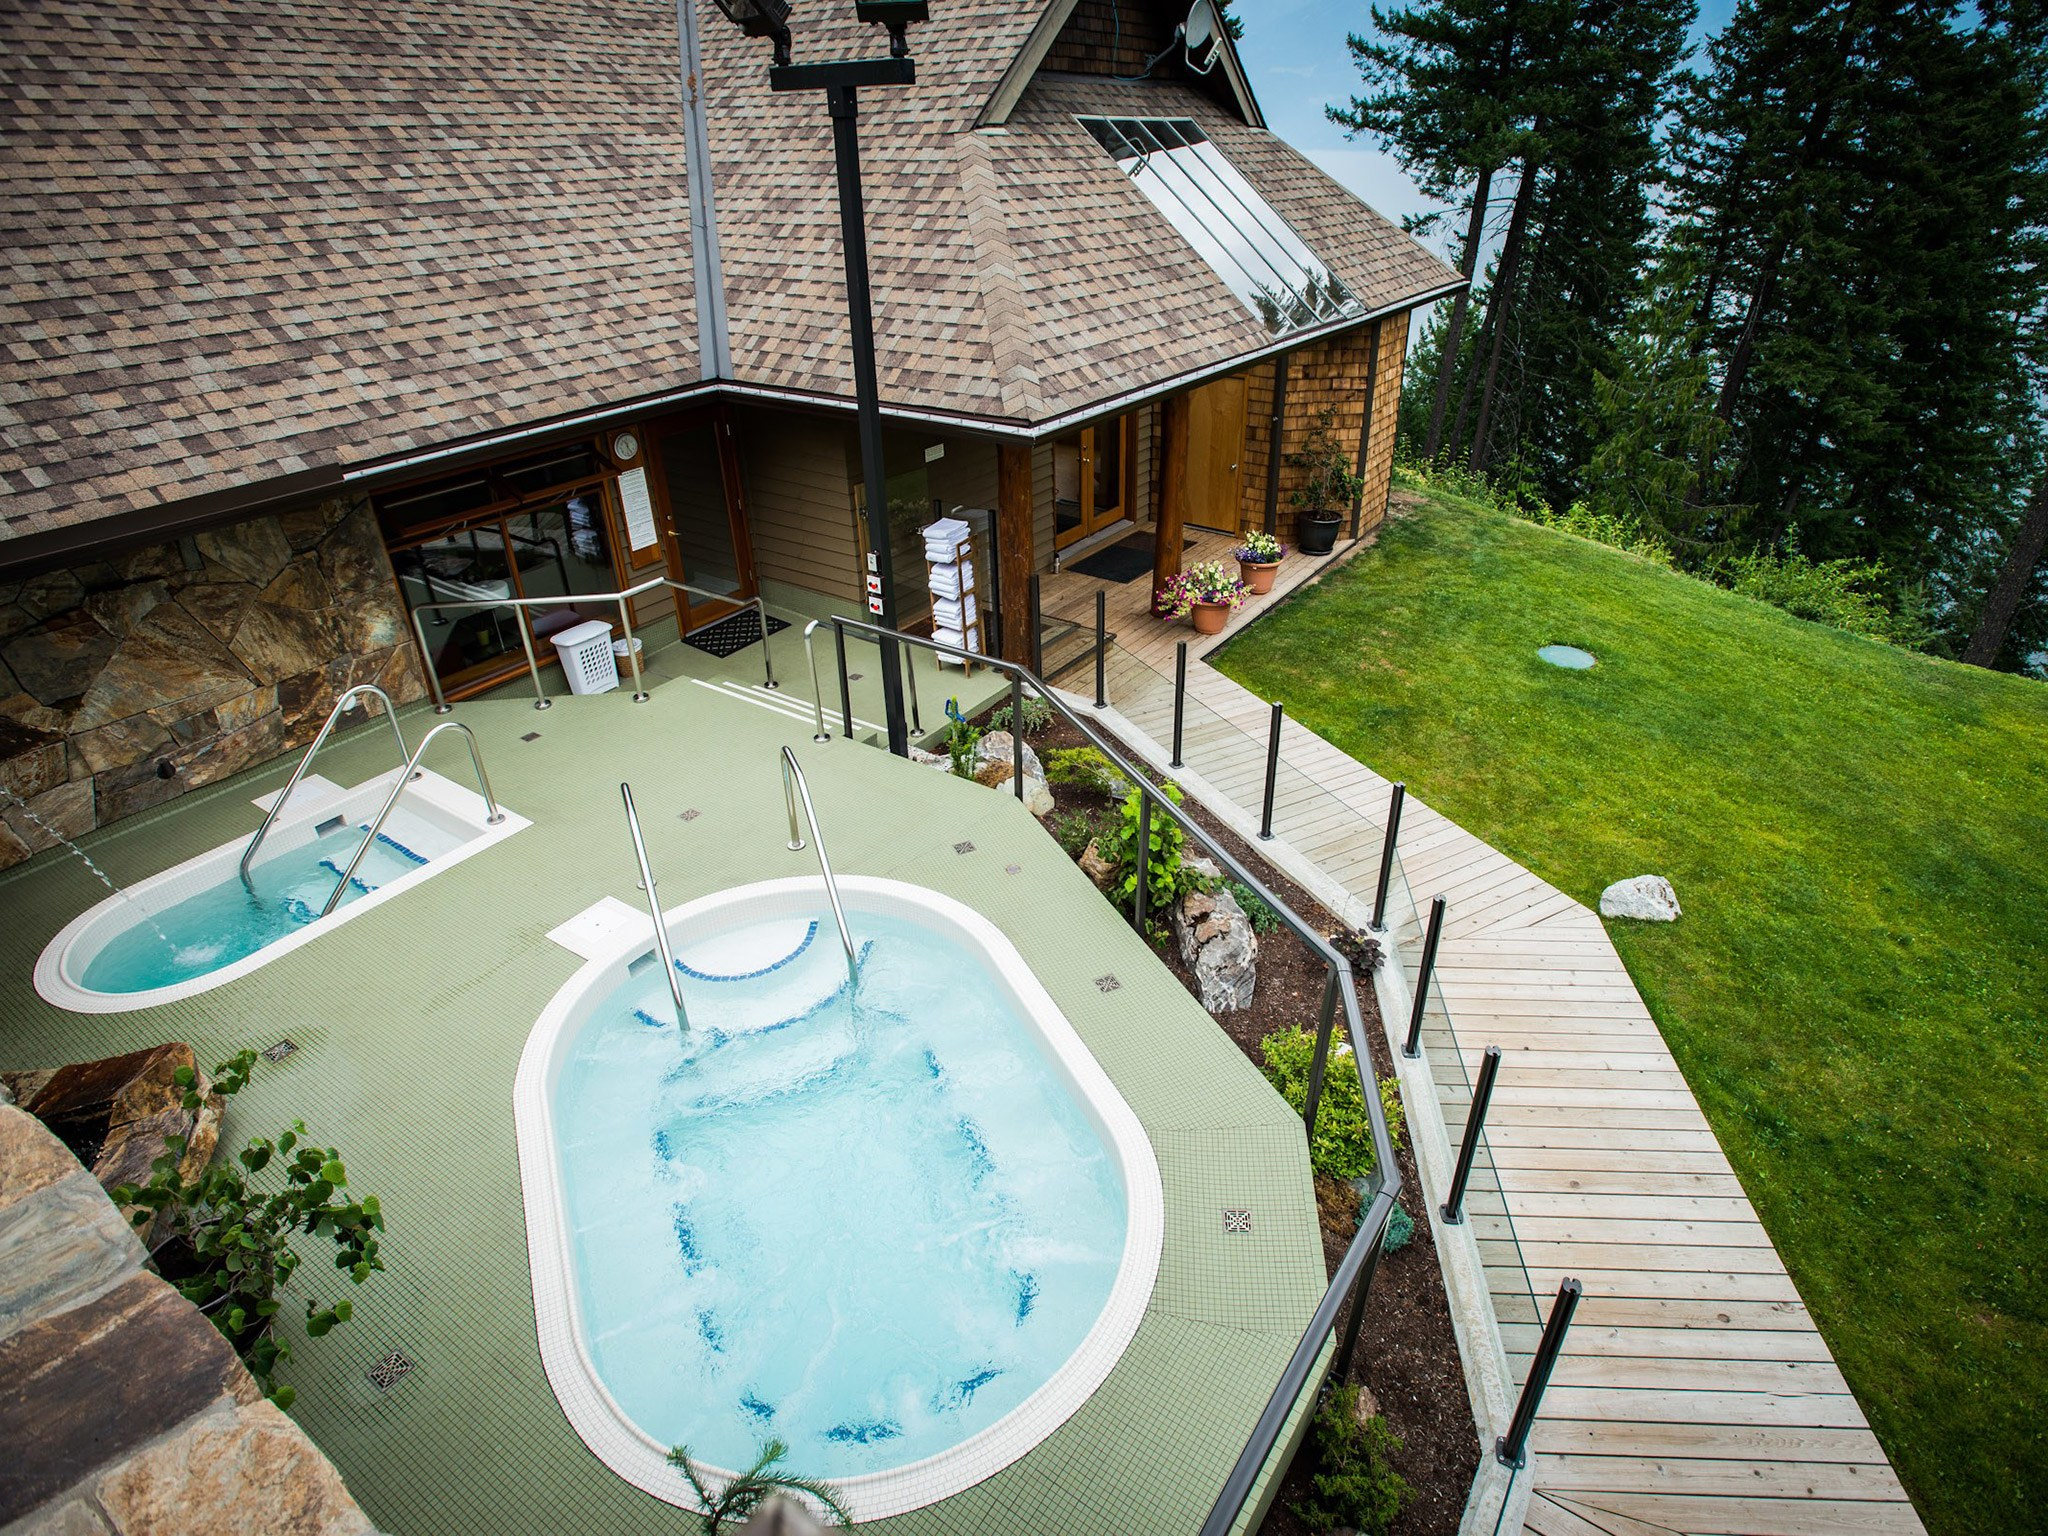 5 Hotels: Wellness & Detox - Mountain Trek Wellness Retreat Canada | Love Daily Dose